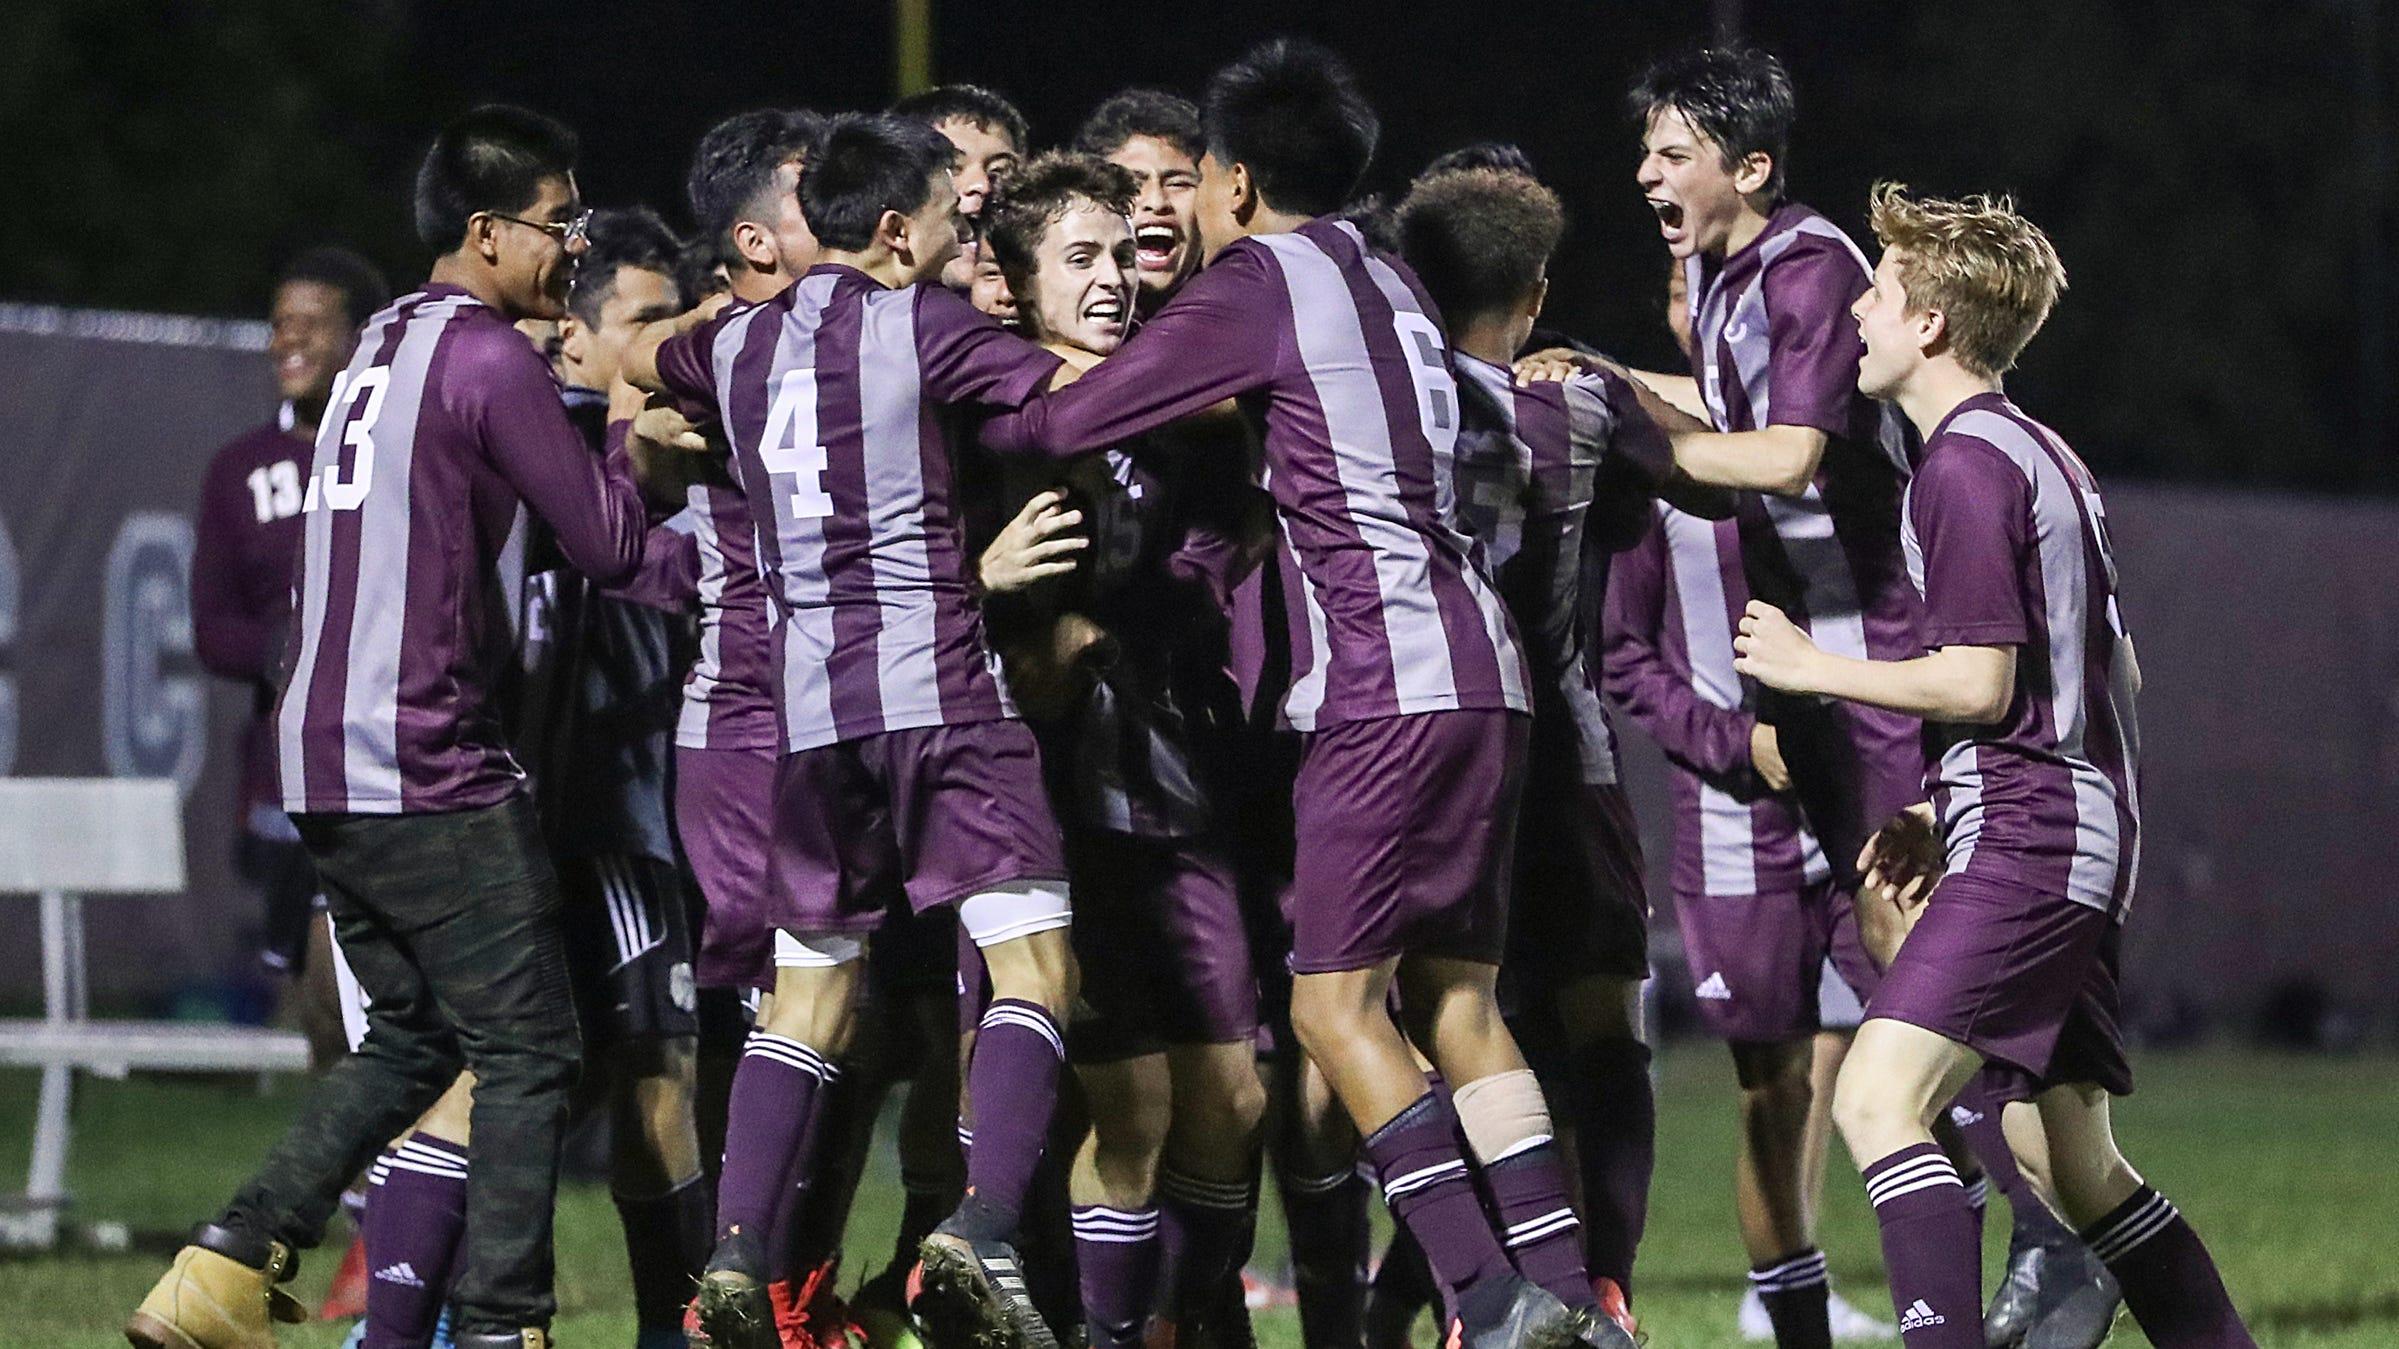 Lawrence Central has renewed belief for boys soccer program